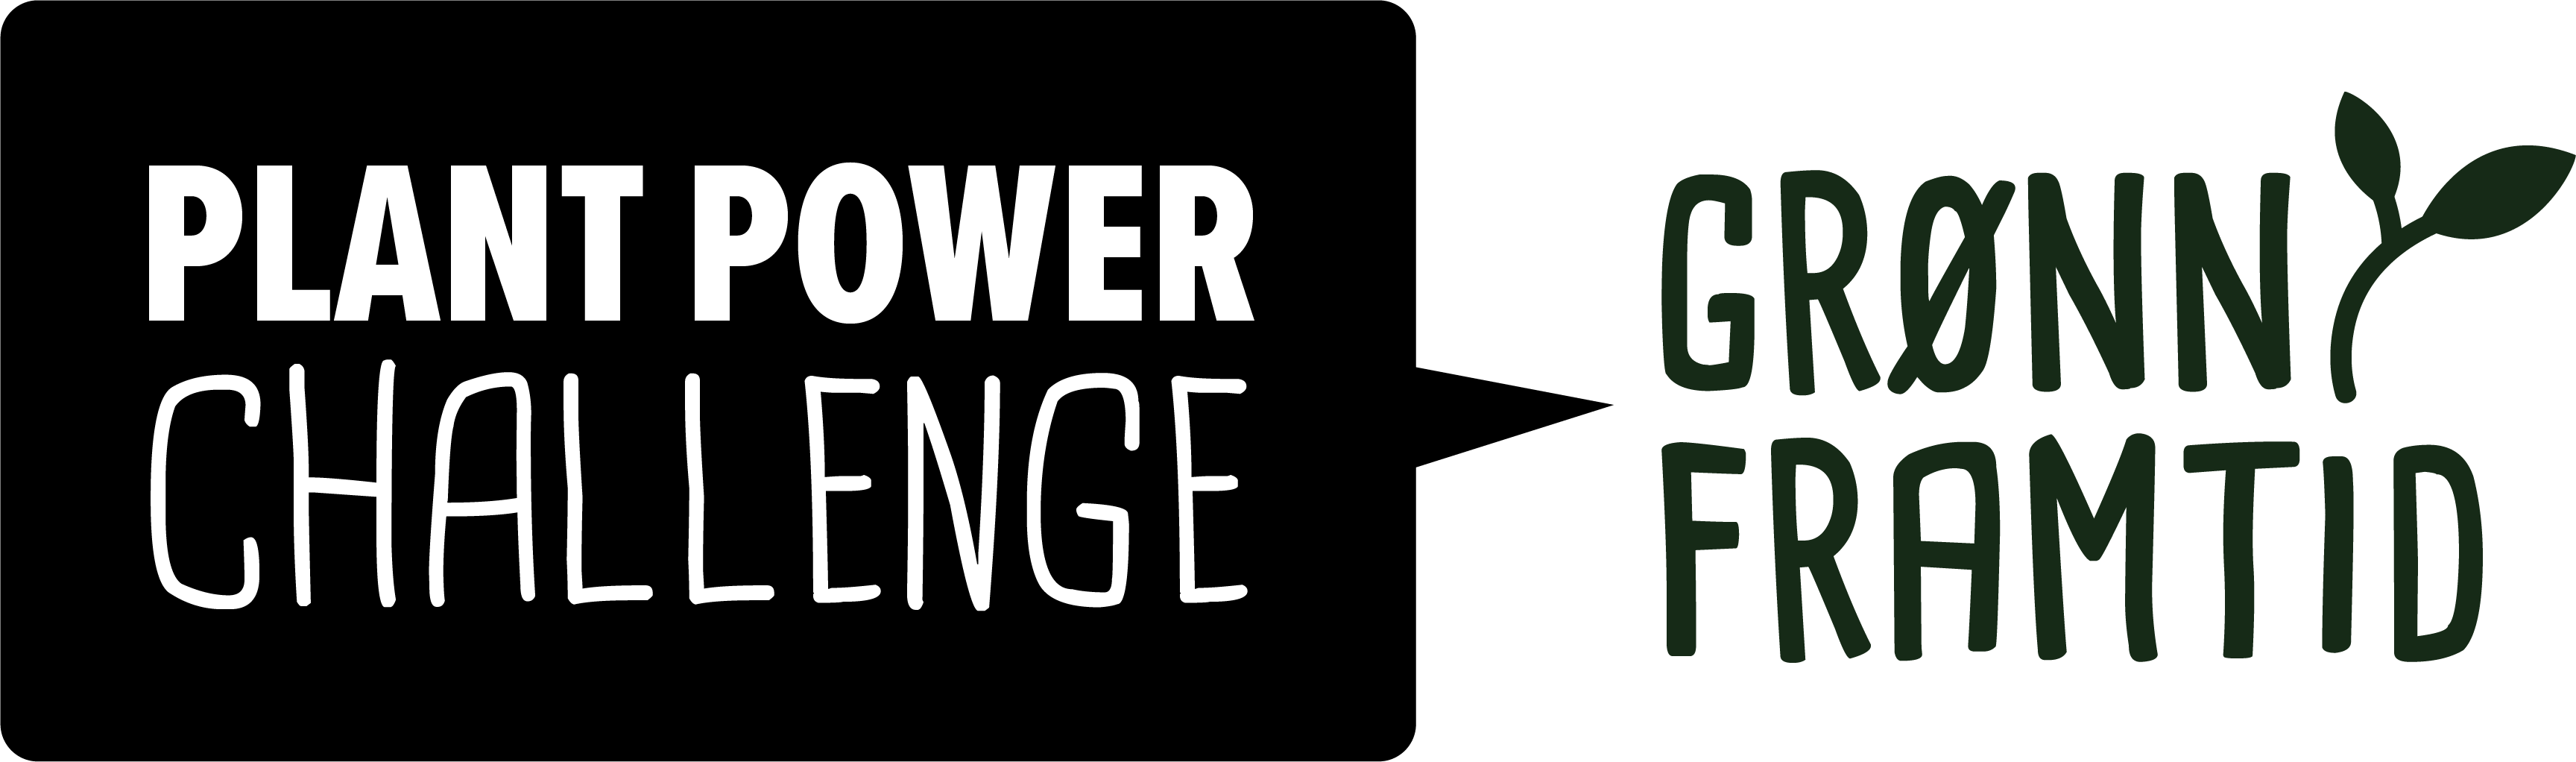 Plant Power Challenge